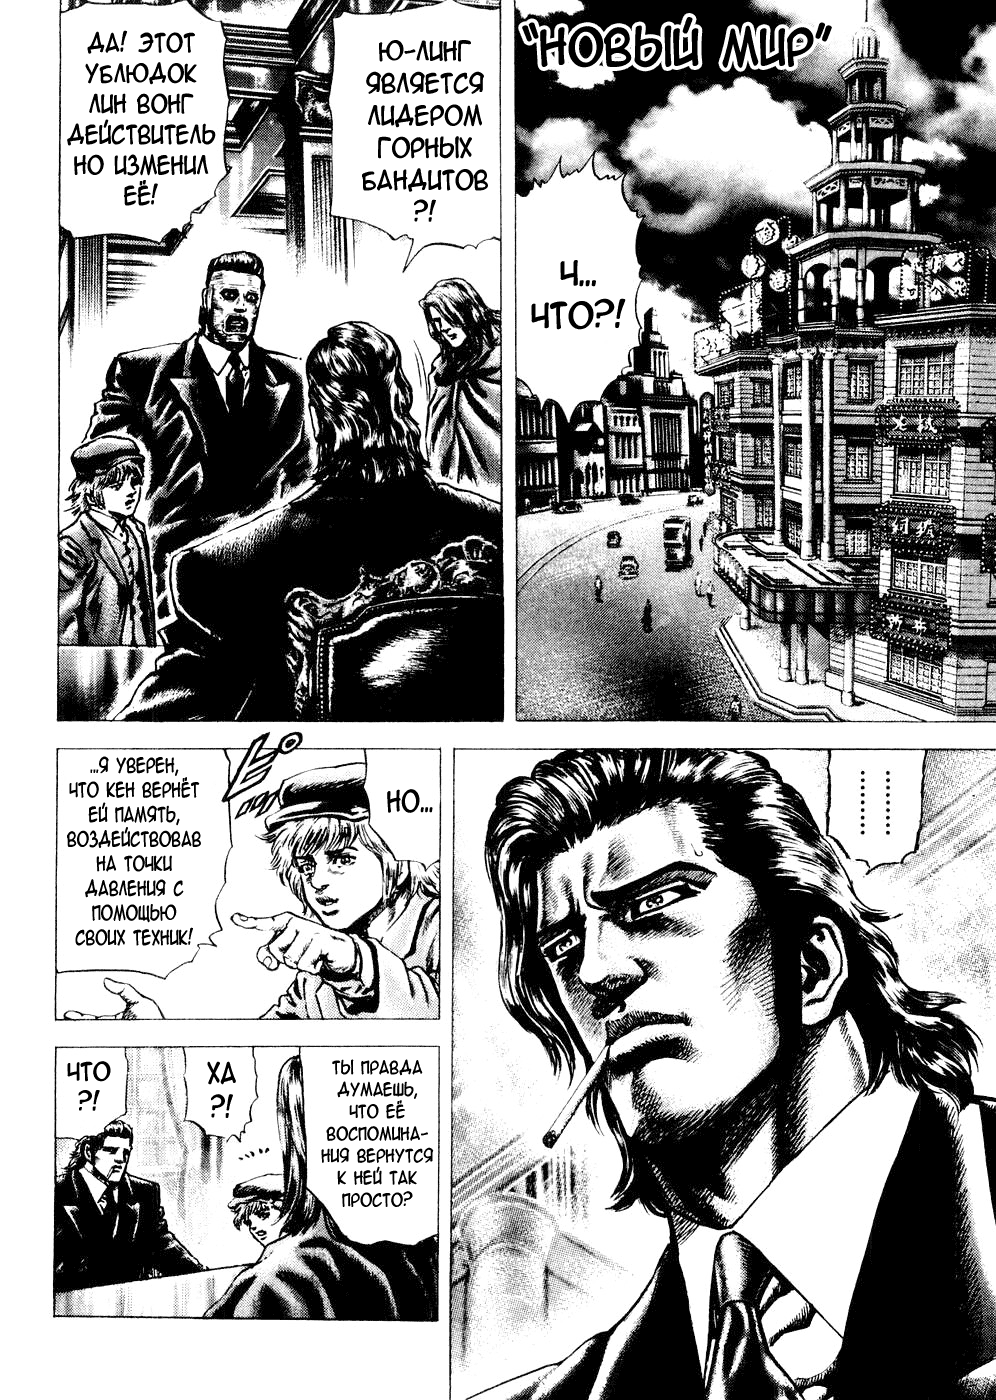 https://r1.ninemanga.com/comics/pic2/6/29190/292249/1461595065334.jpg Page 8